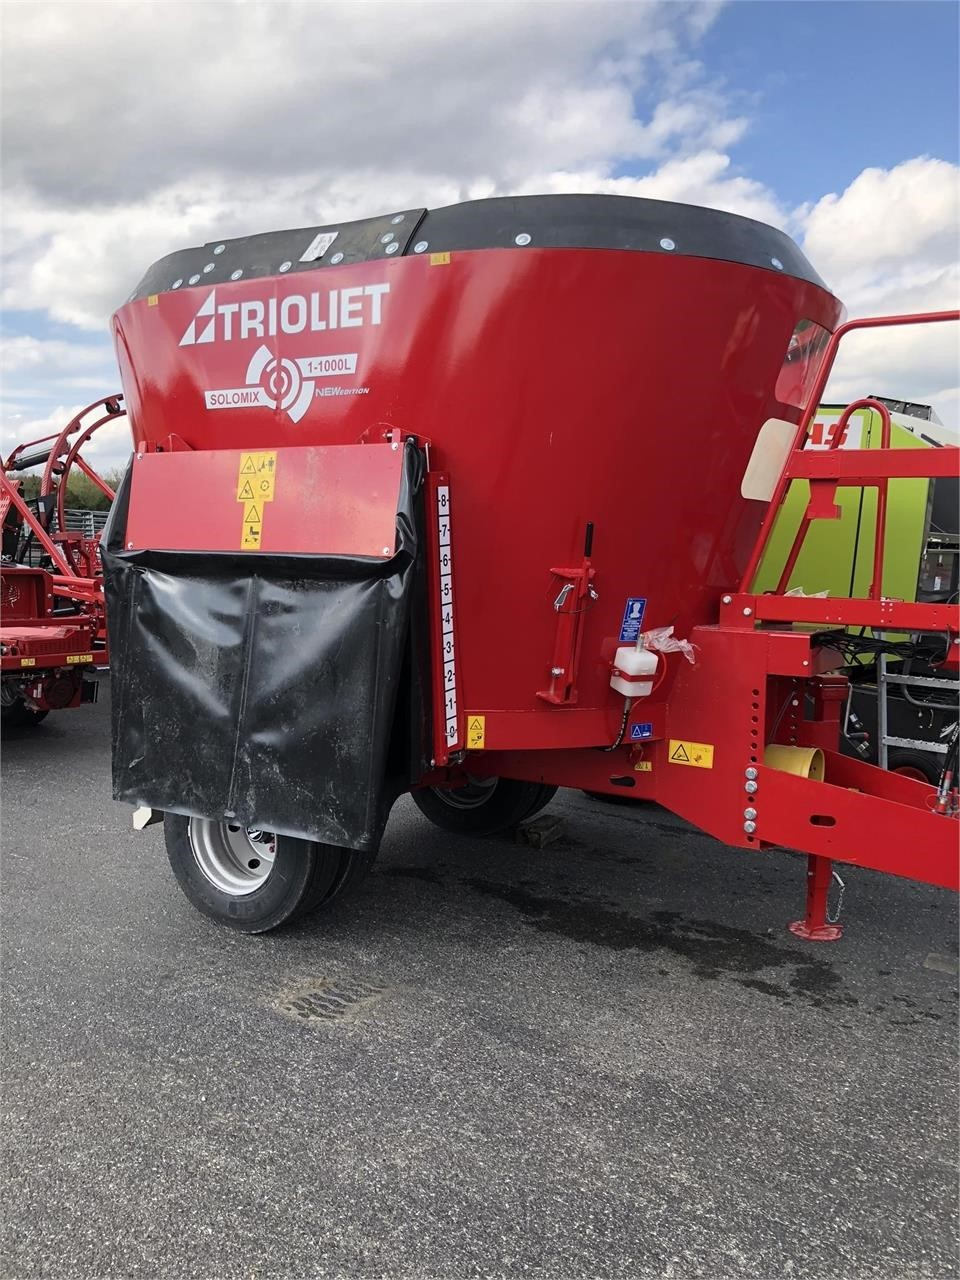 Trioliet Solomix 1-1000L ZK Grinders and Mixer